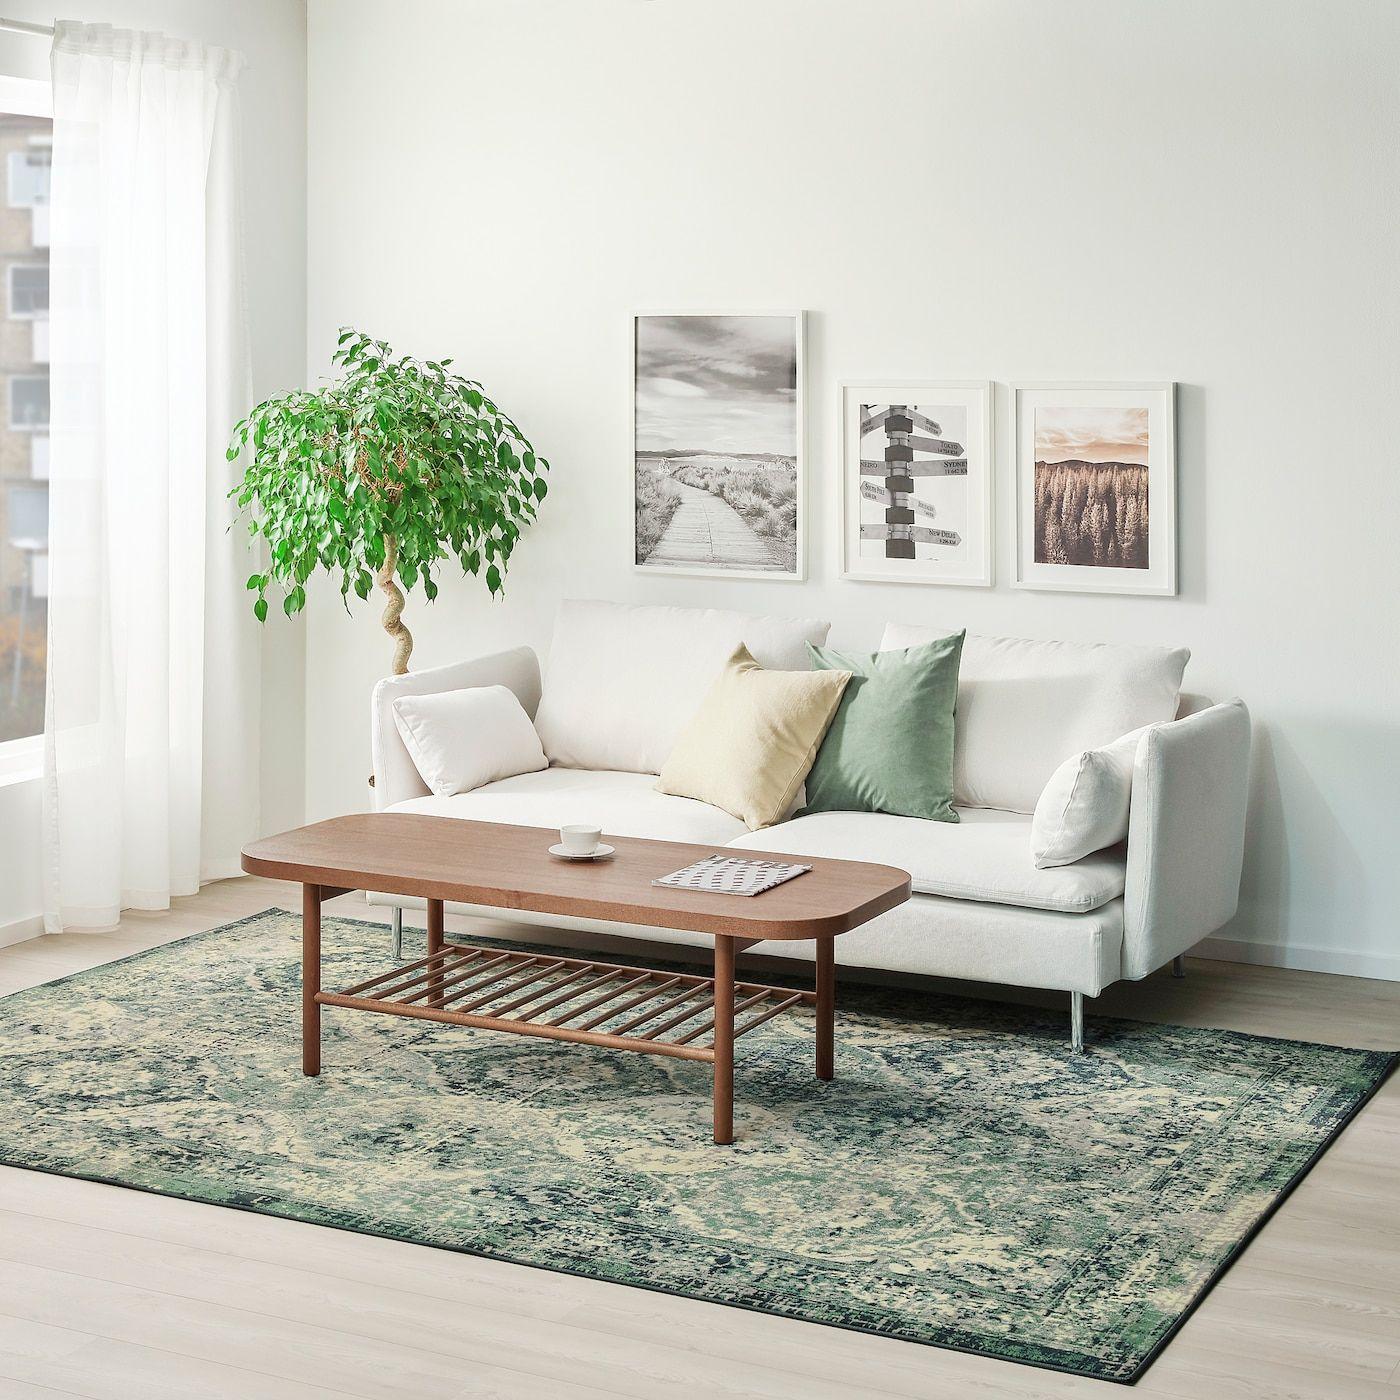 Ikea Stockholm Oval Coffee Table In Walnut Veneer Aptdeco Ikea Stockholm Coffee Table Oval Coffee Tables [ 1000 x 1000 Pixel ]